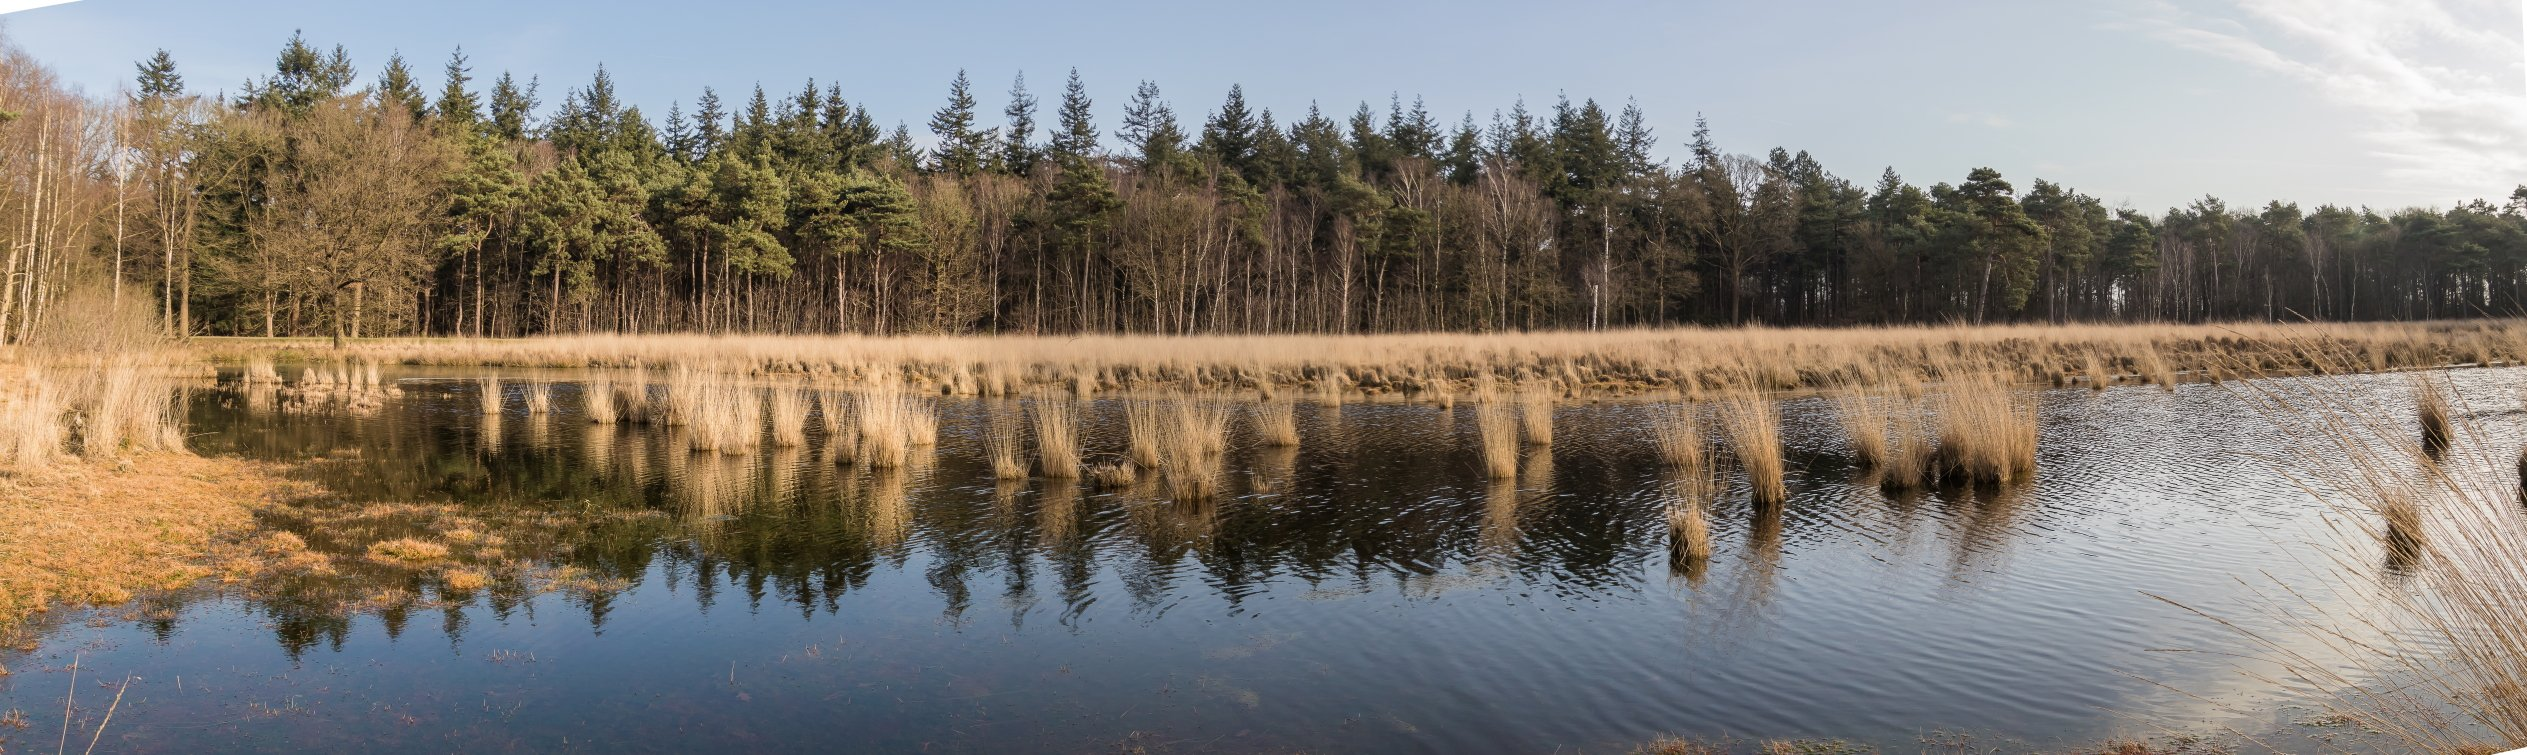 natuur 3 Galderse Heide (13)